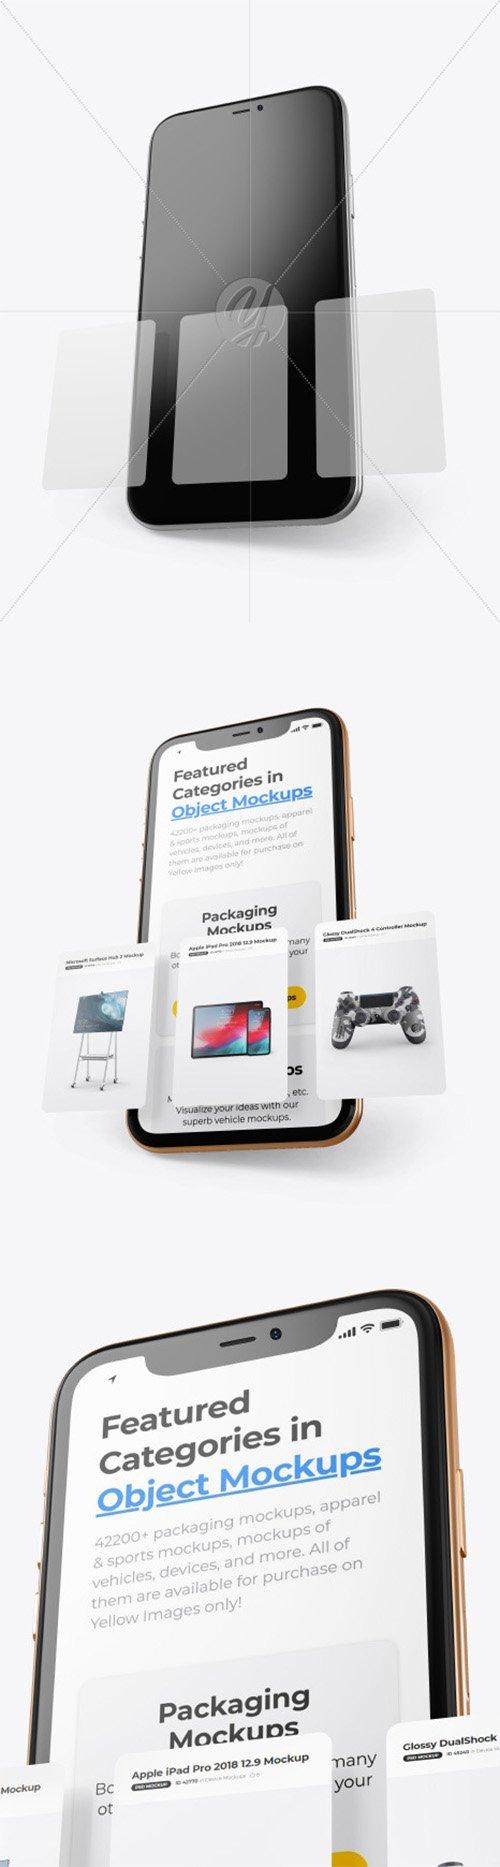 Apple iPhone 11 Pro w/ Cards Mockup 65051